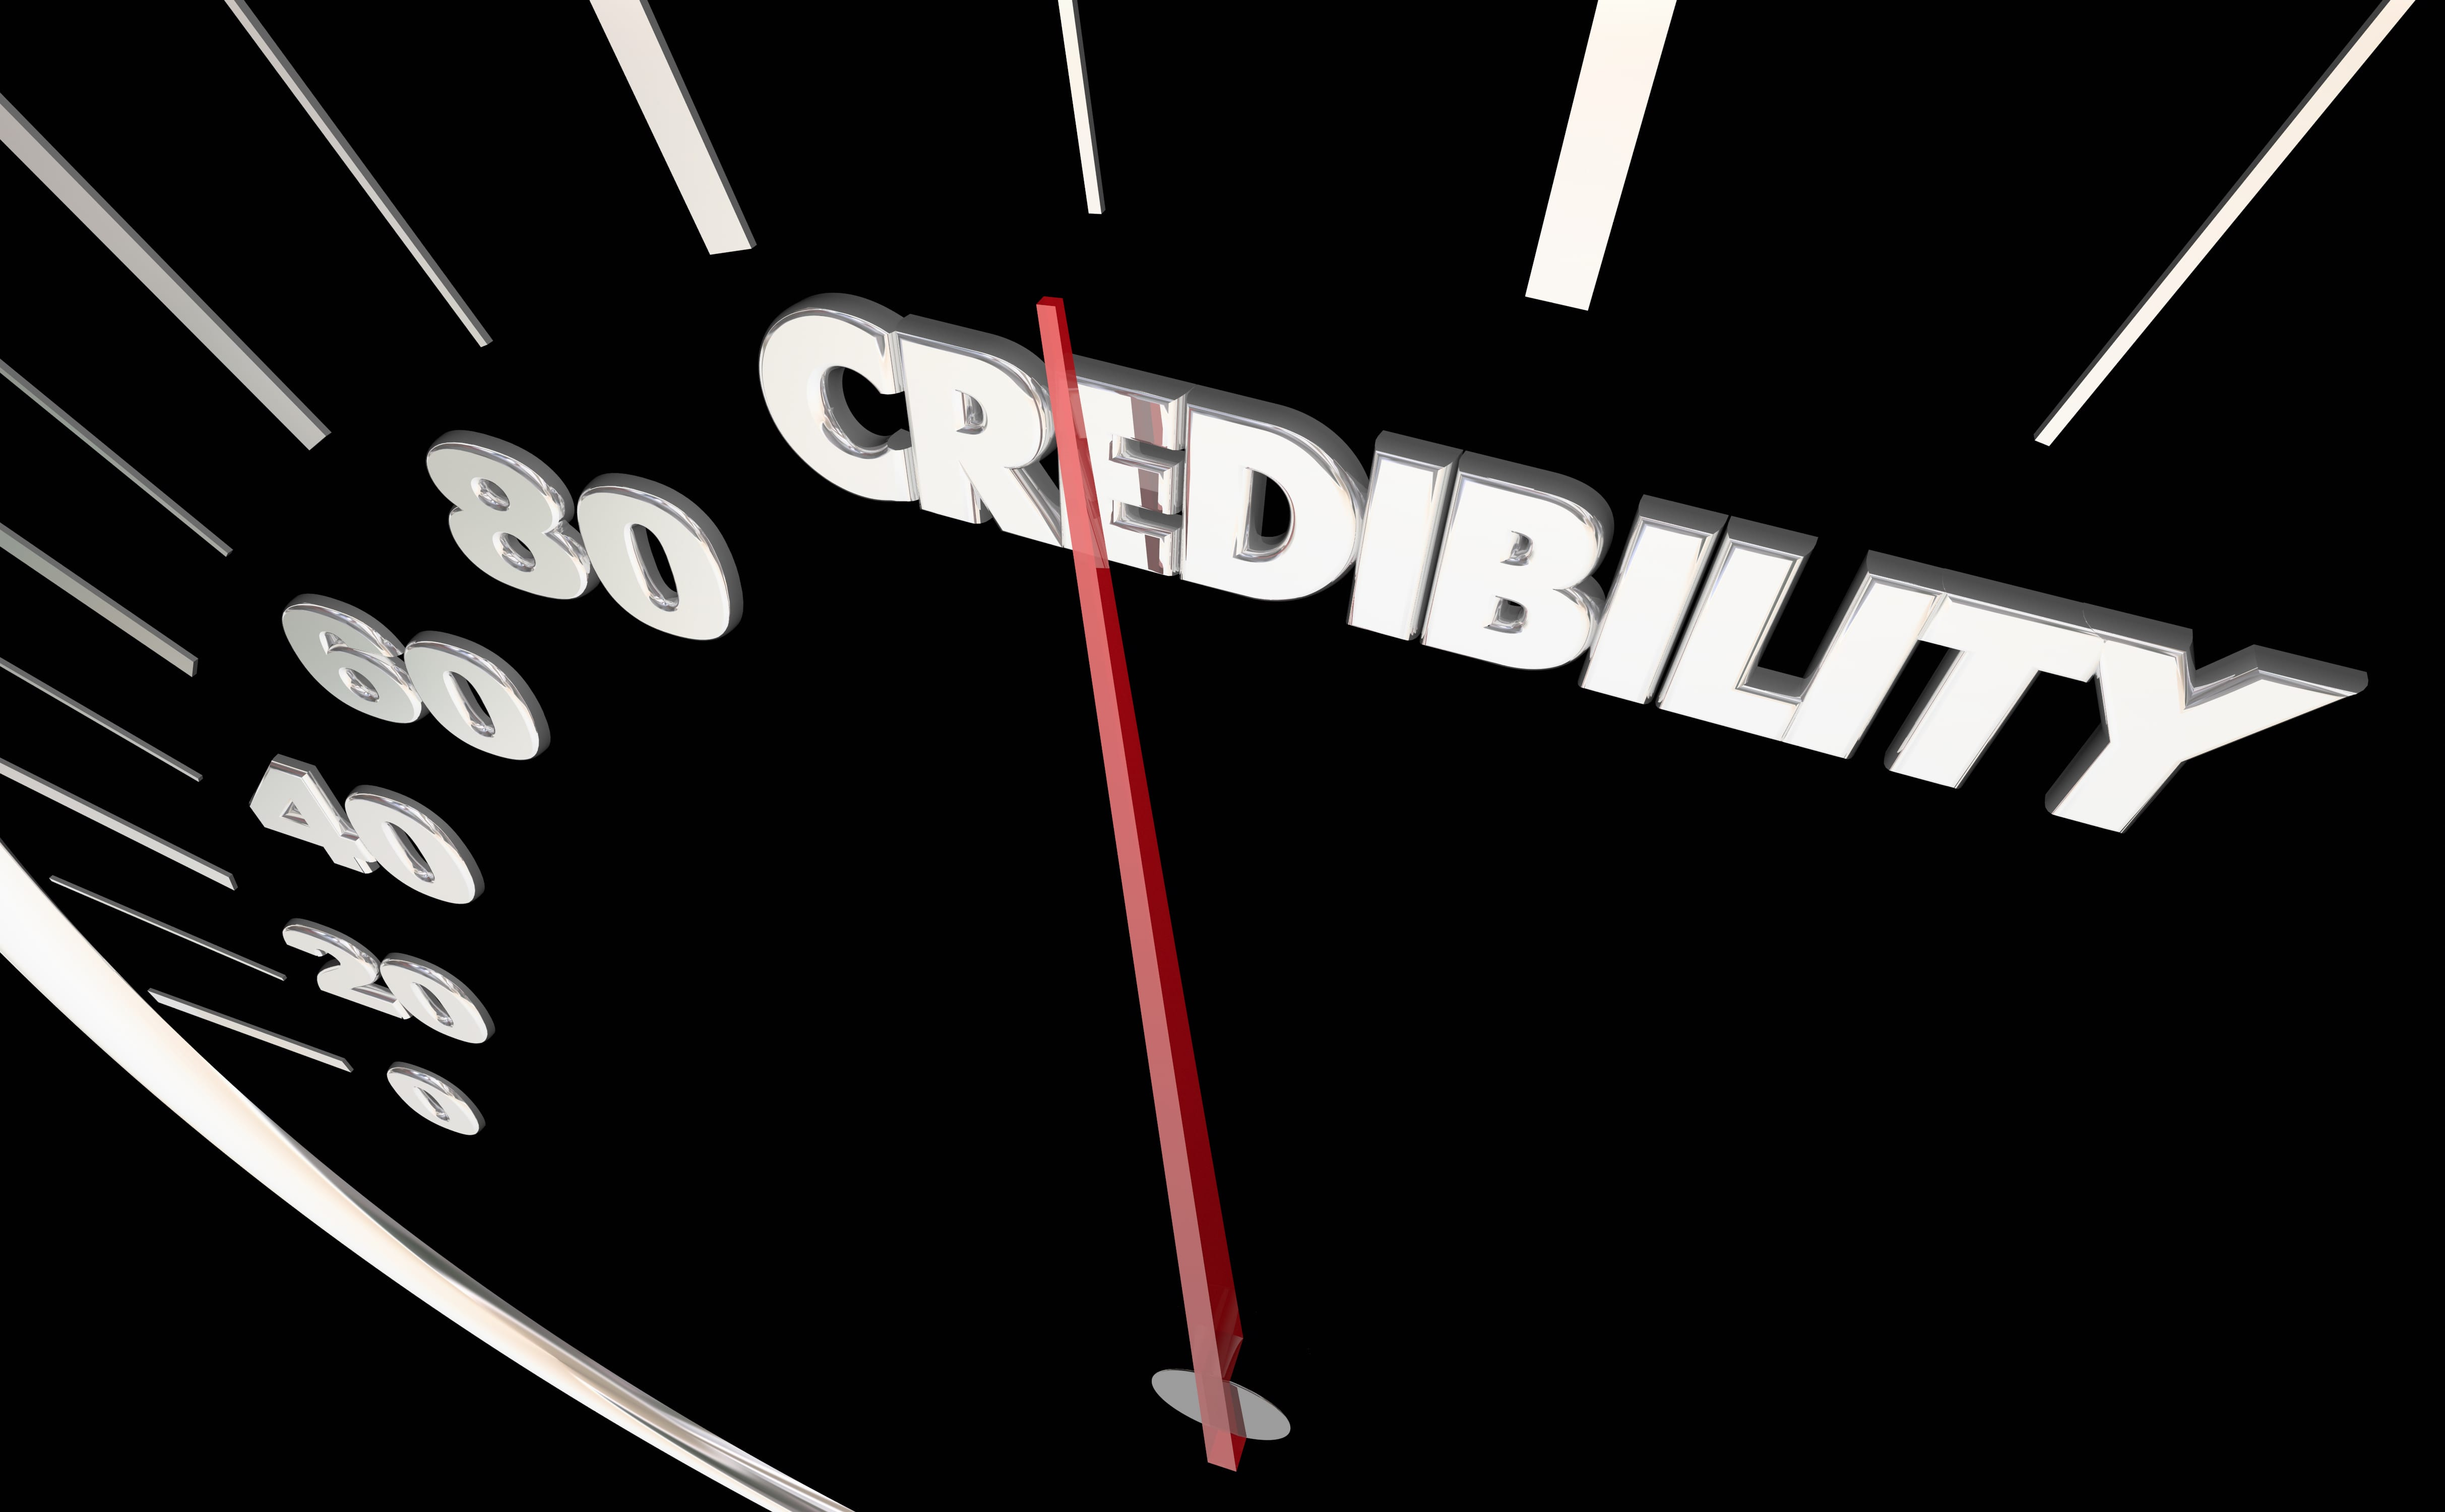 Better Credibility